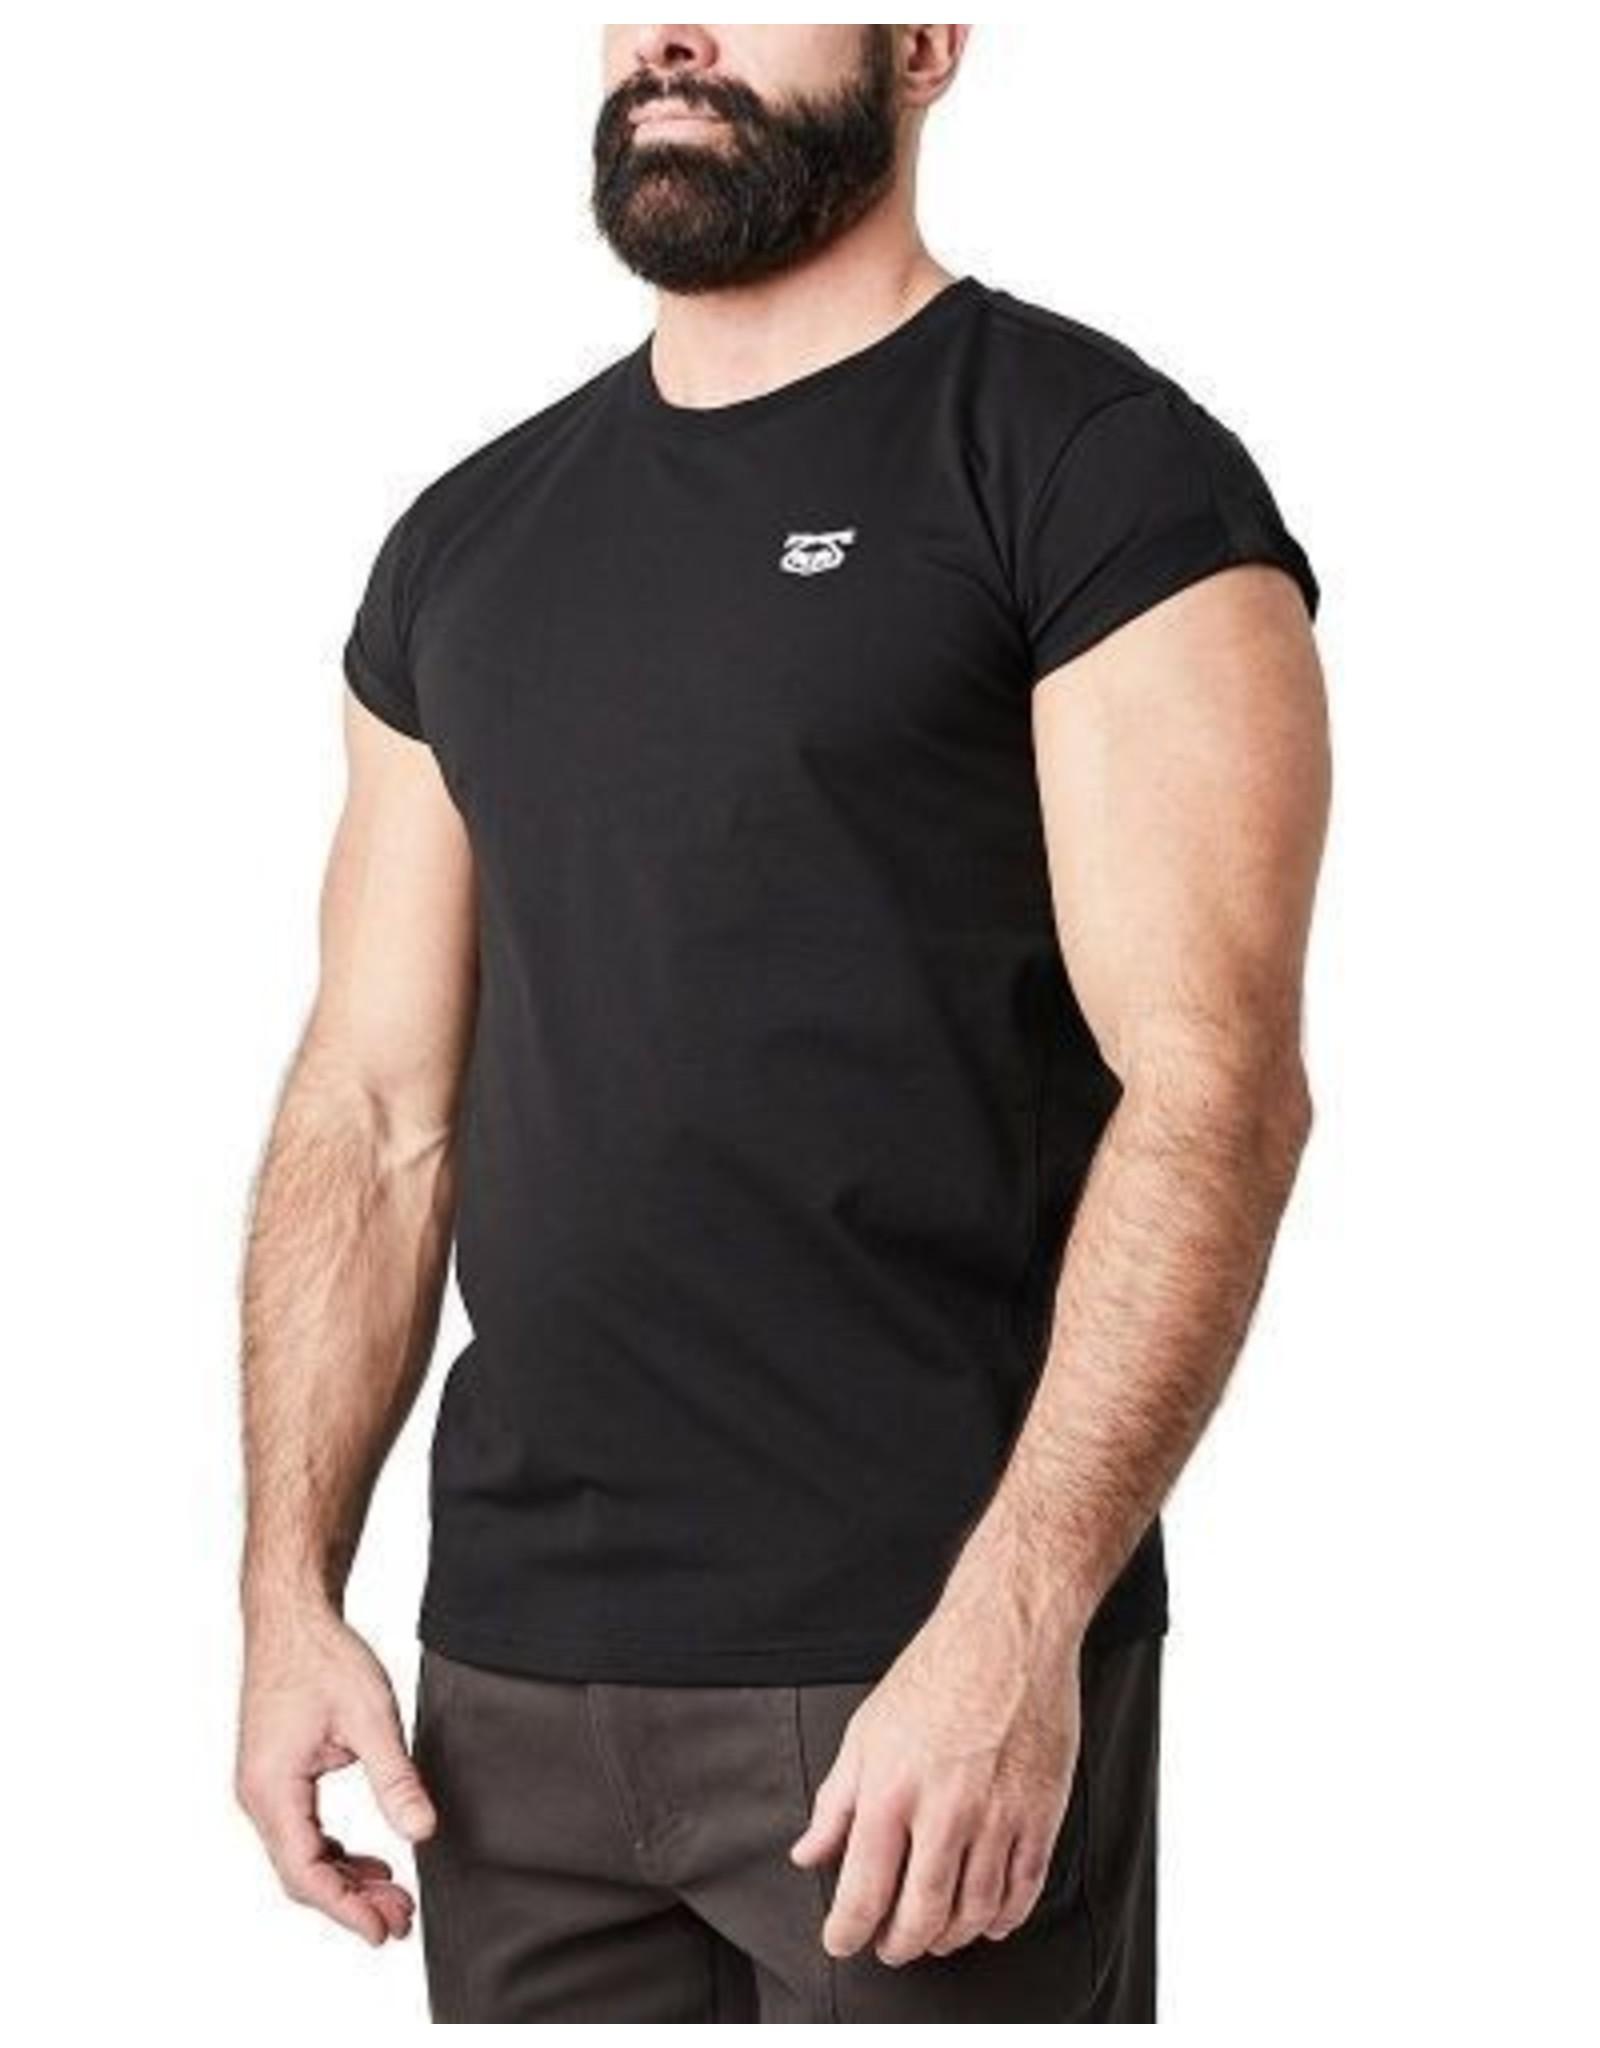 Nasty Pig Nasty Pig Ripcord Shirt